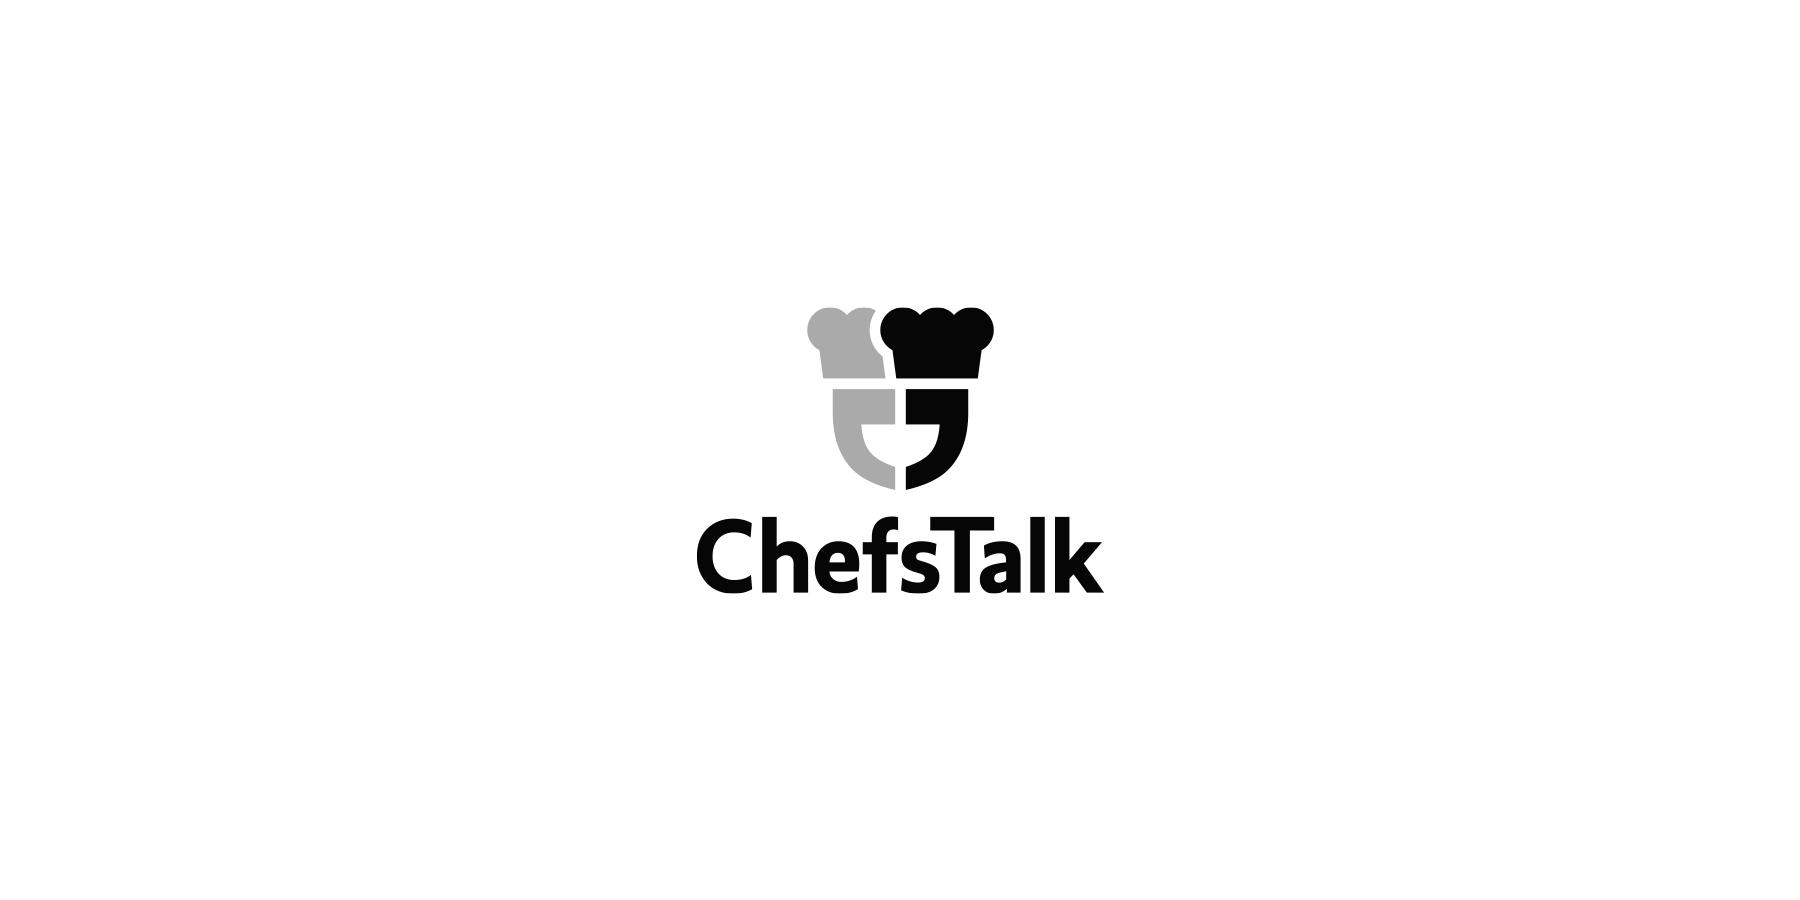 chefstalk-logo-design-01